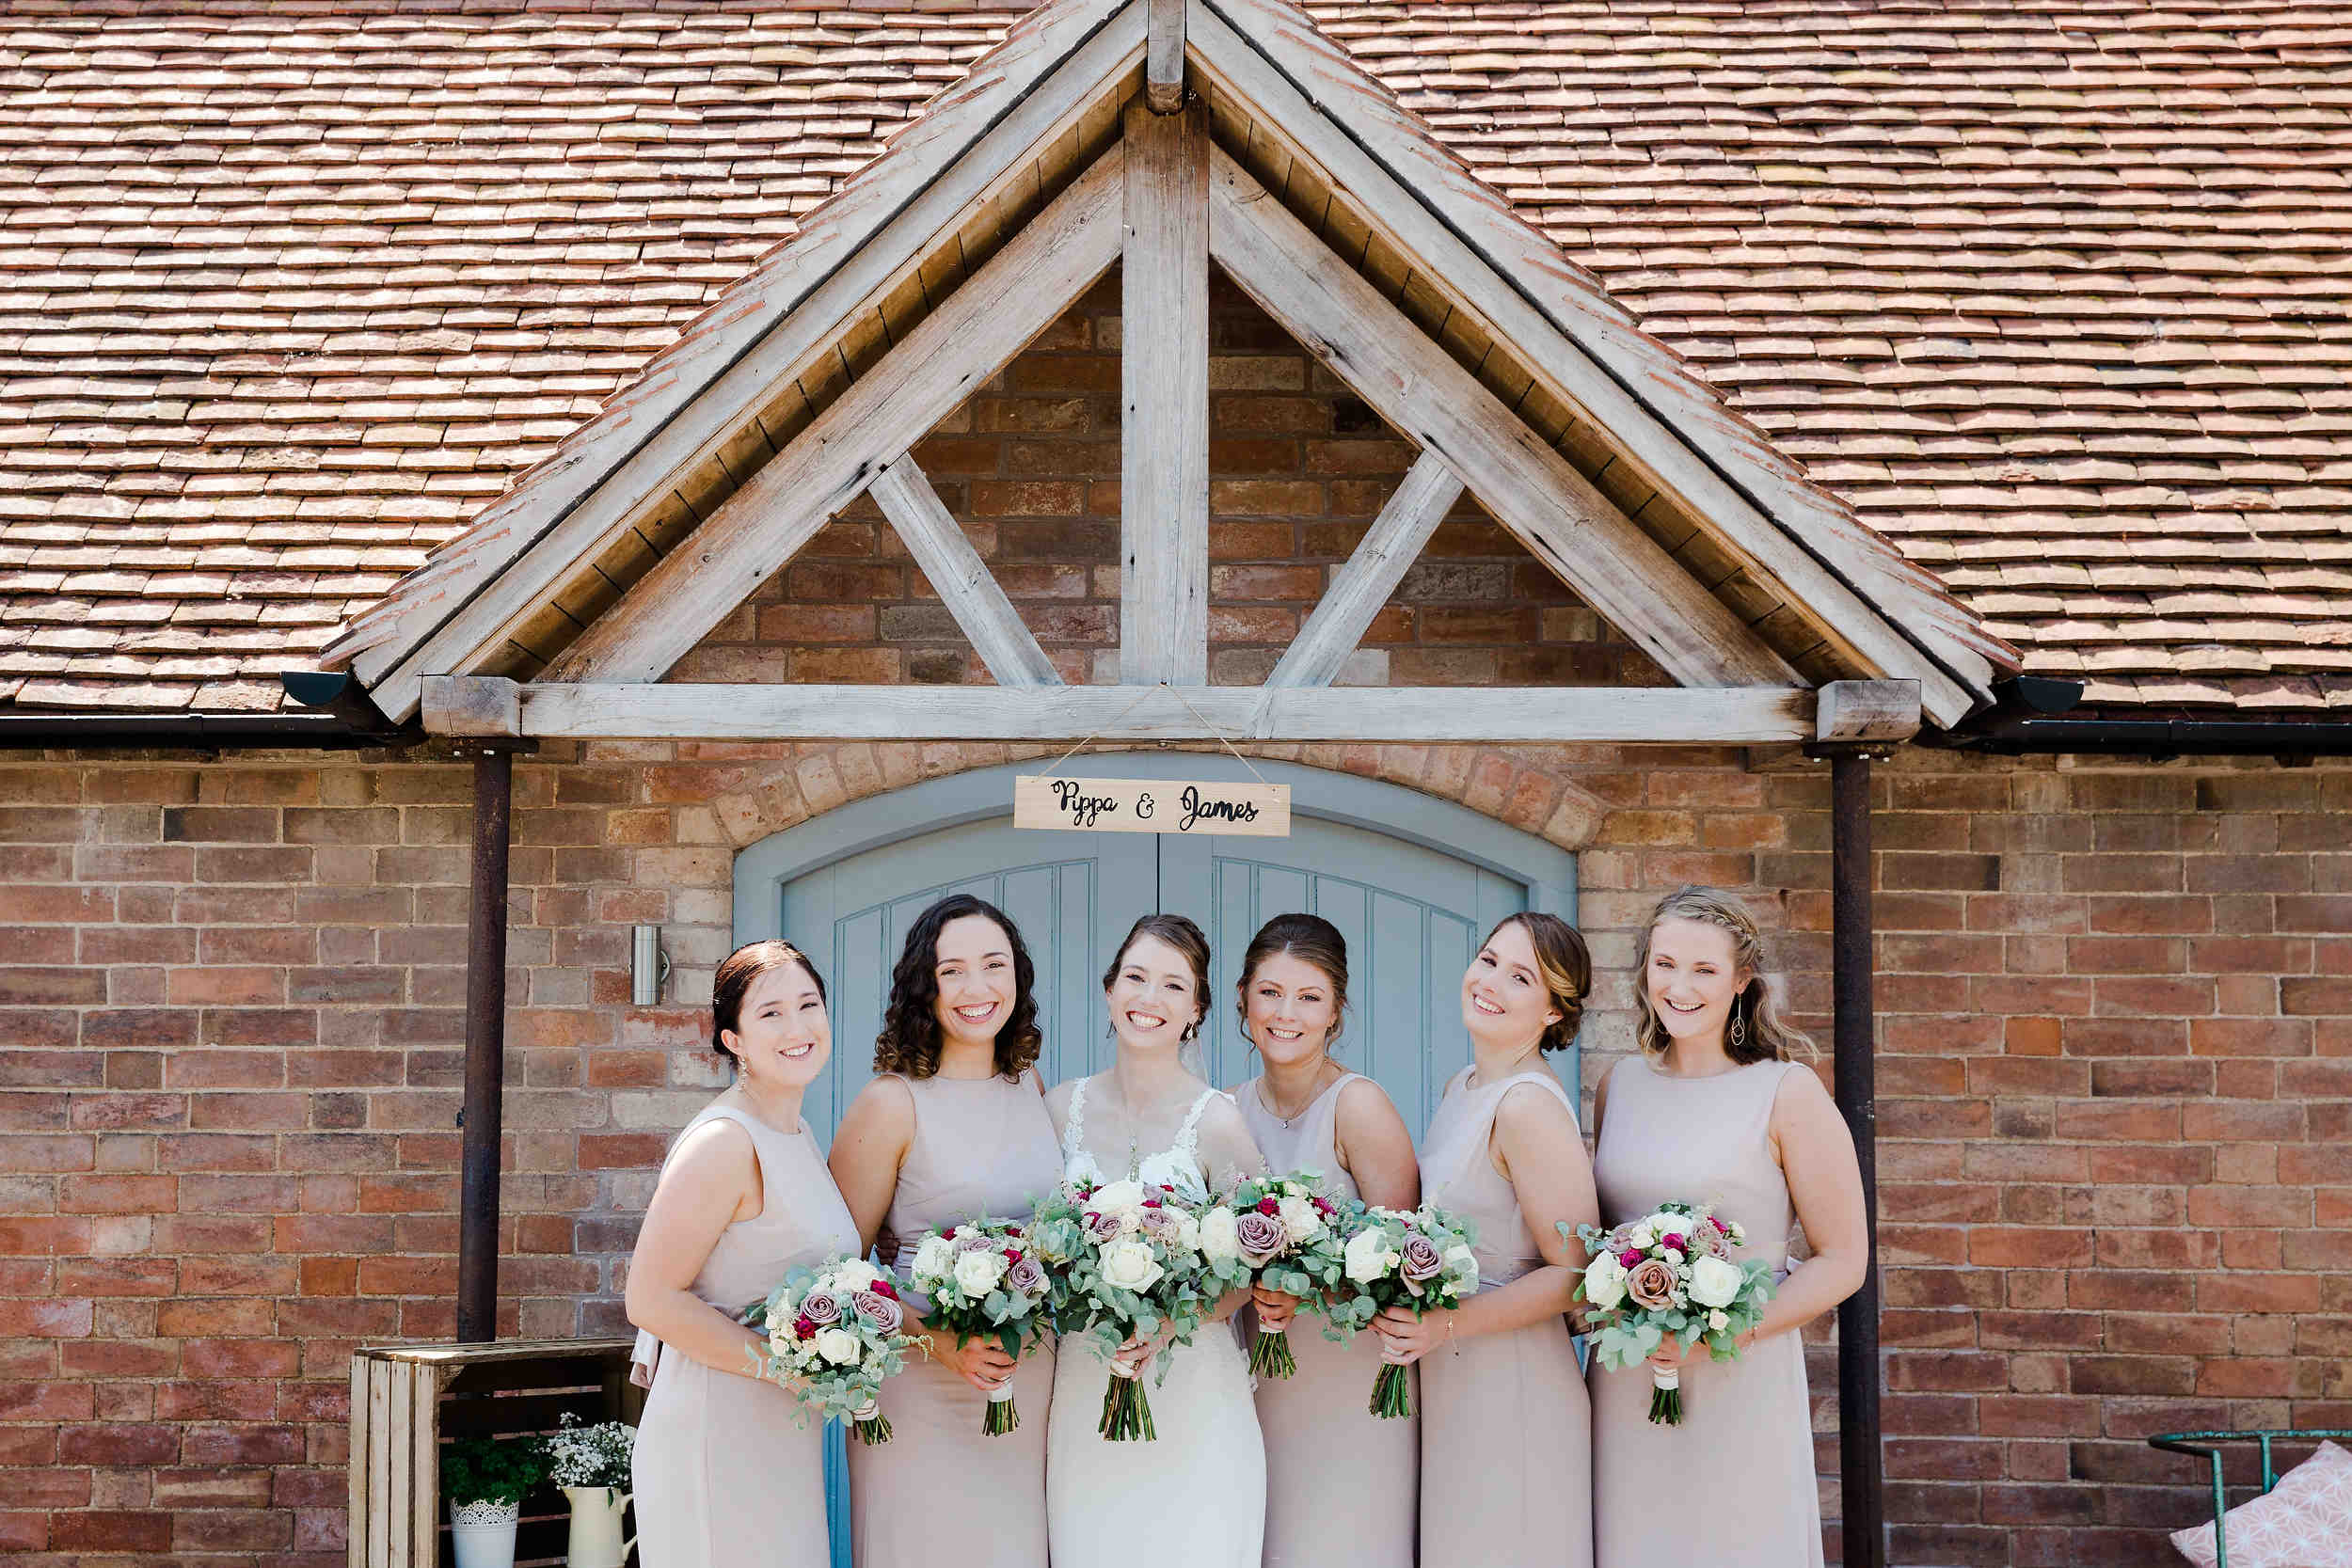 Modern_Stylish_Wedding_at_Swallows_Nest_Barn1214